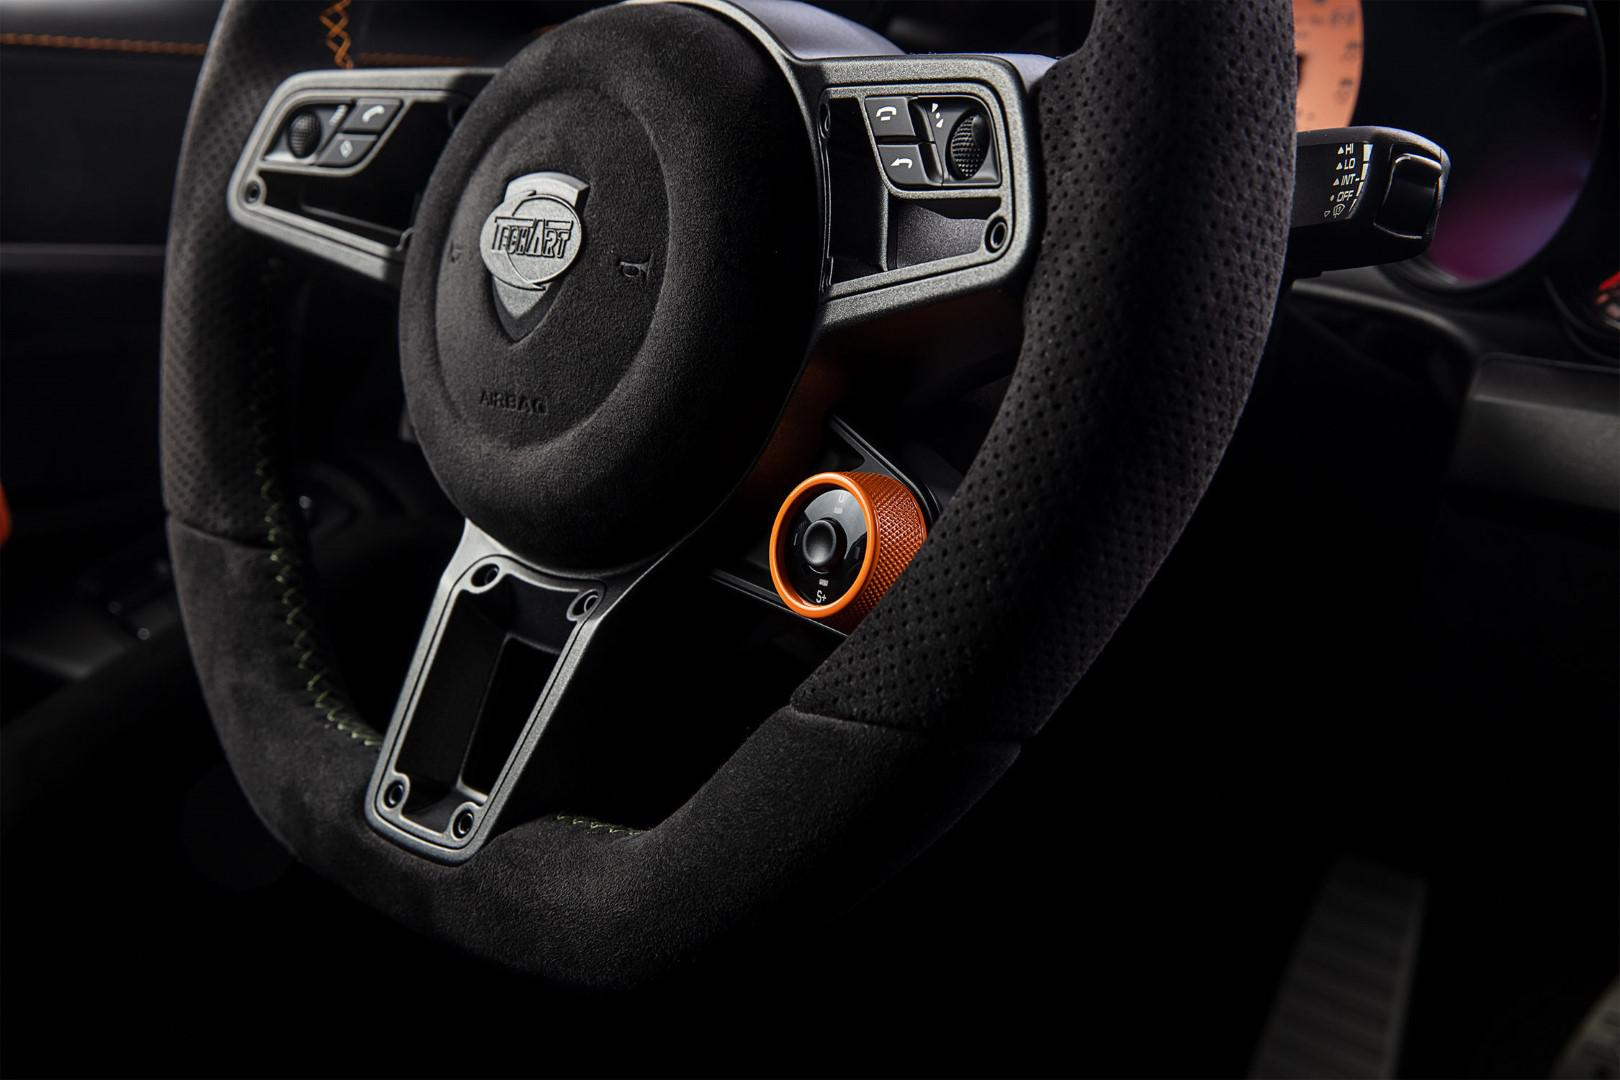 10-exemplaires-seulement-porsche-911-turbo-s-gtstreet-rs-by-techart-1049-4.jpg